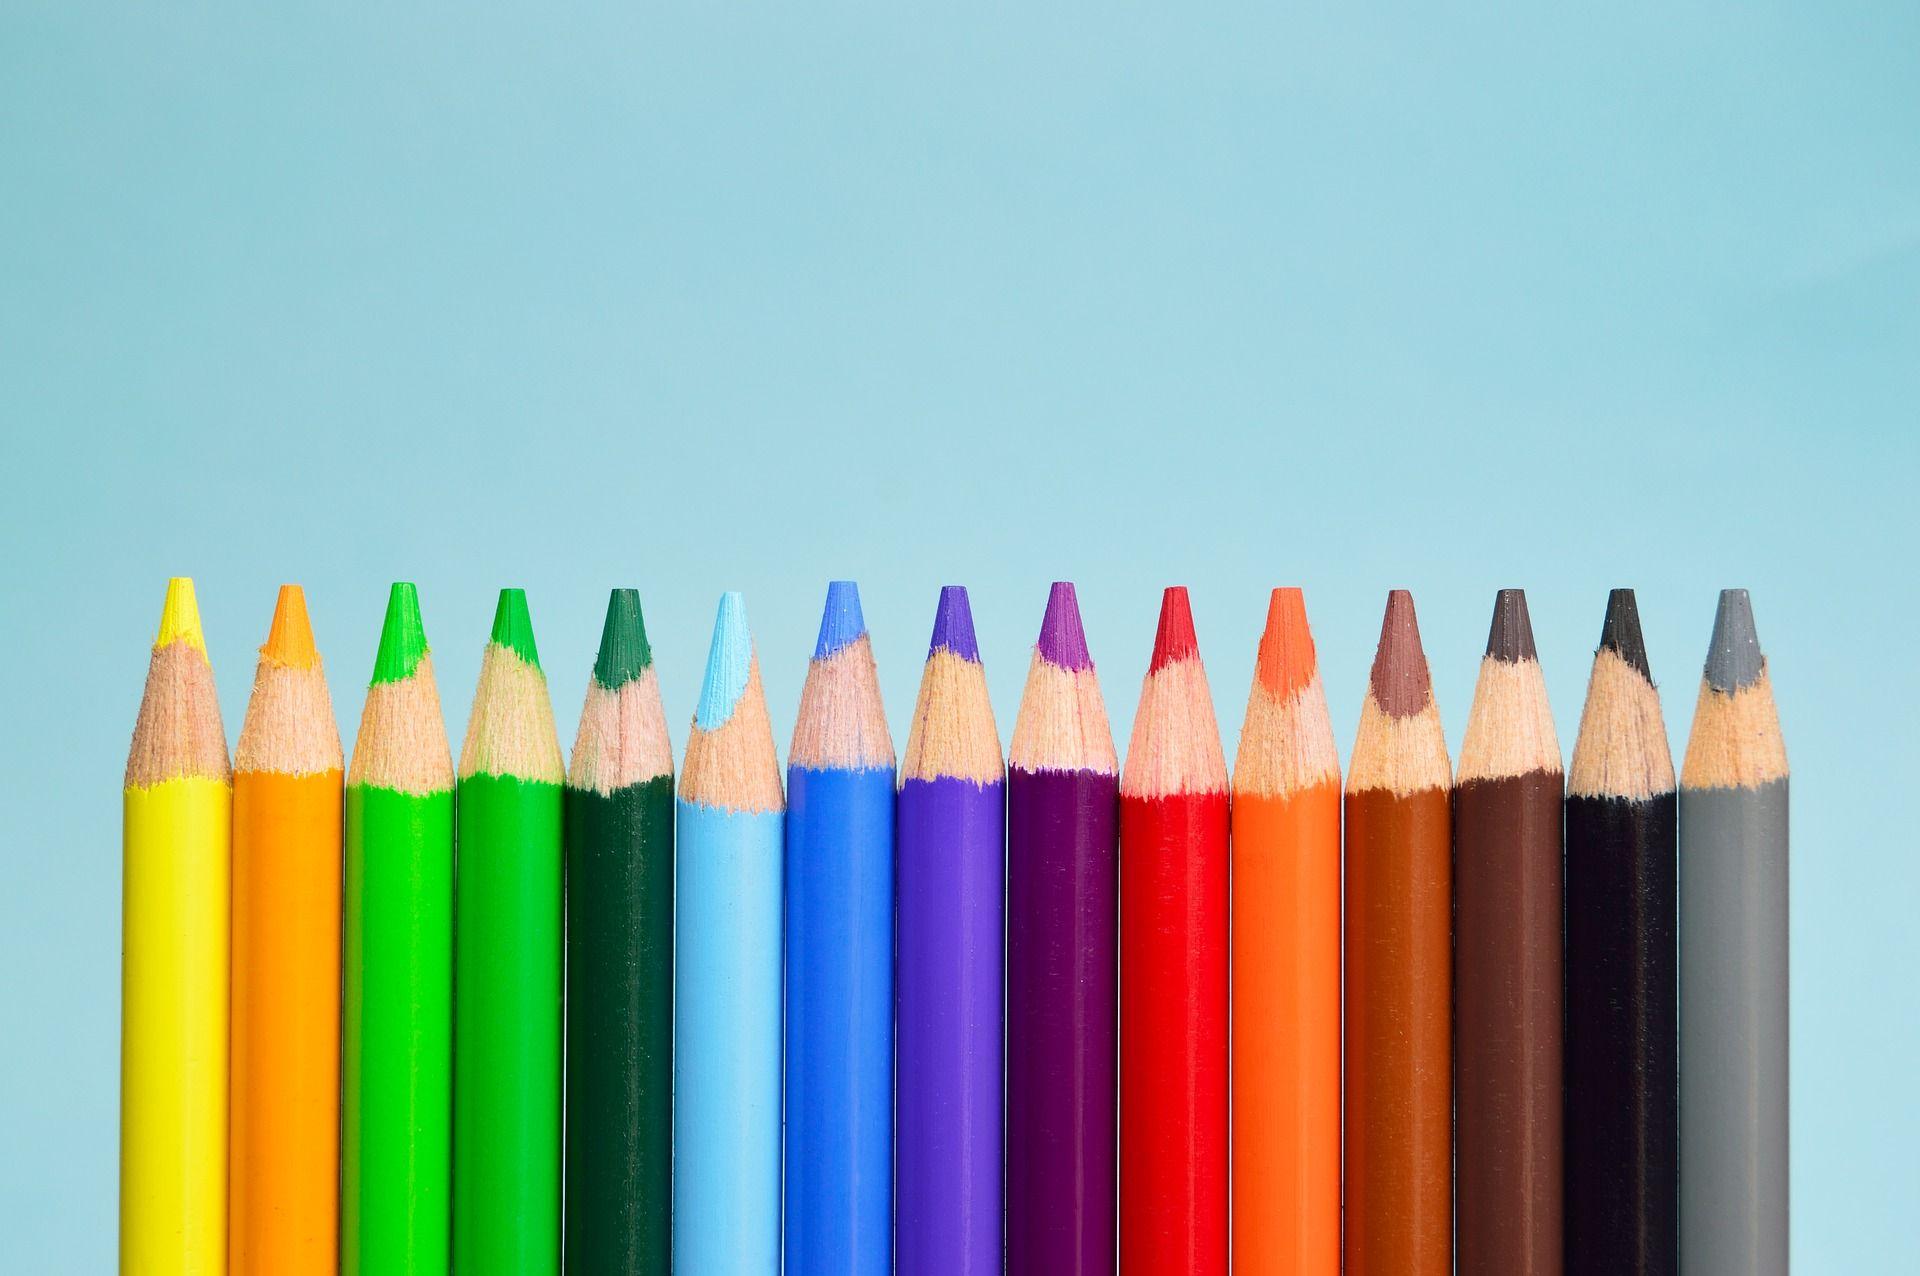 4k color pencils wallpapers